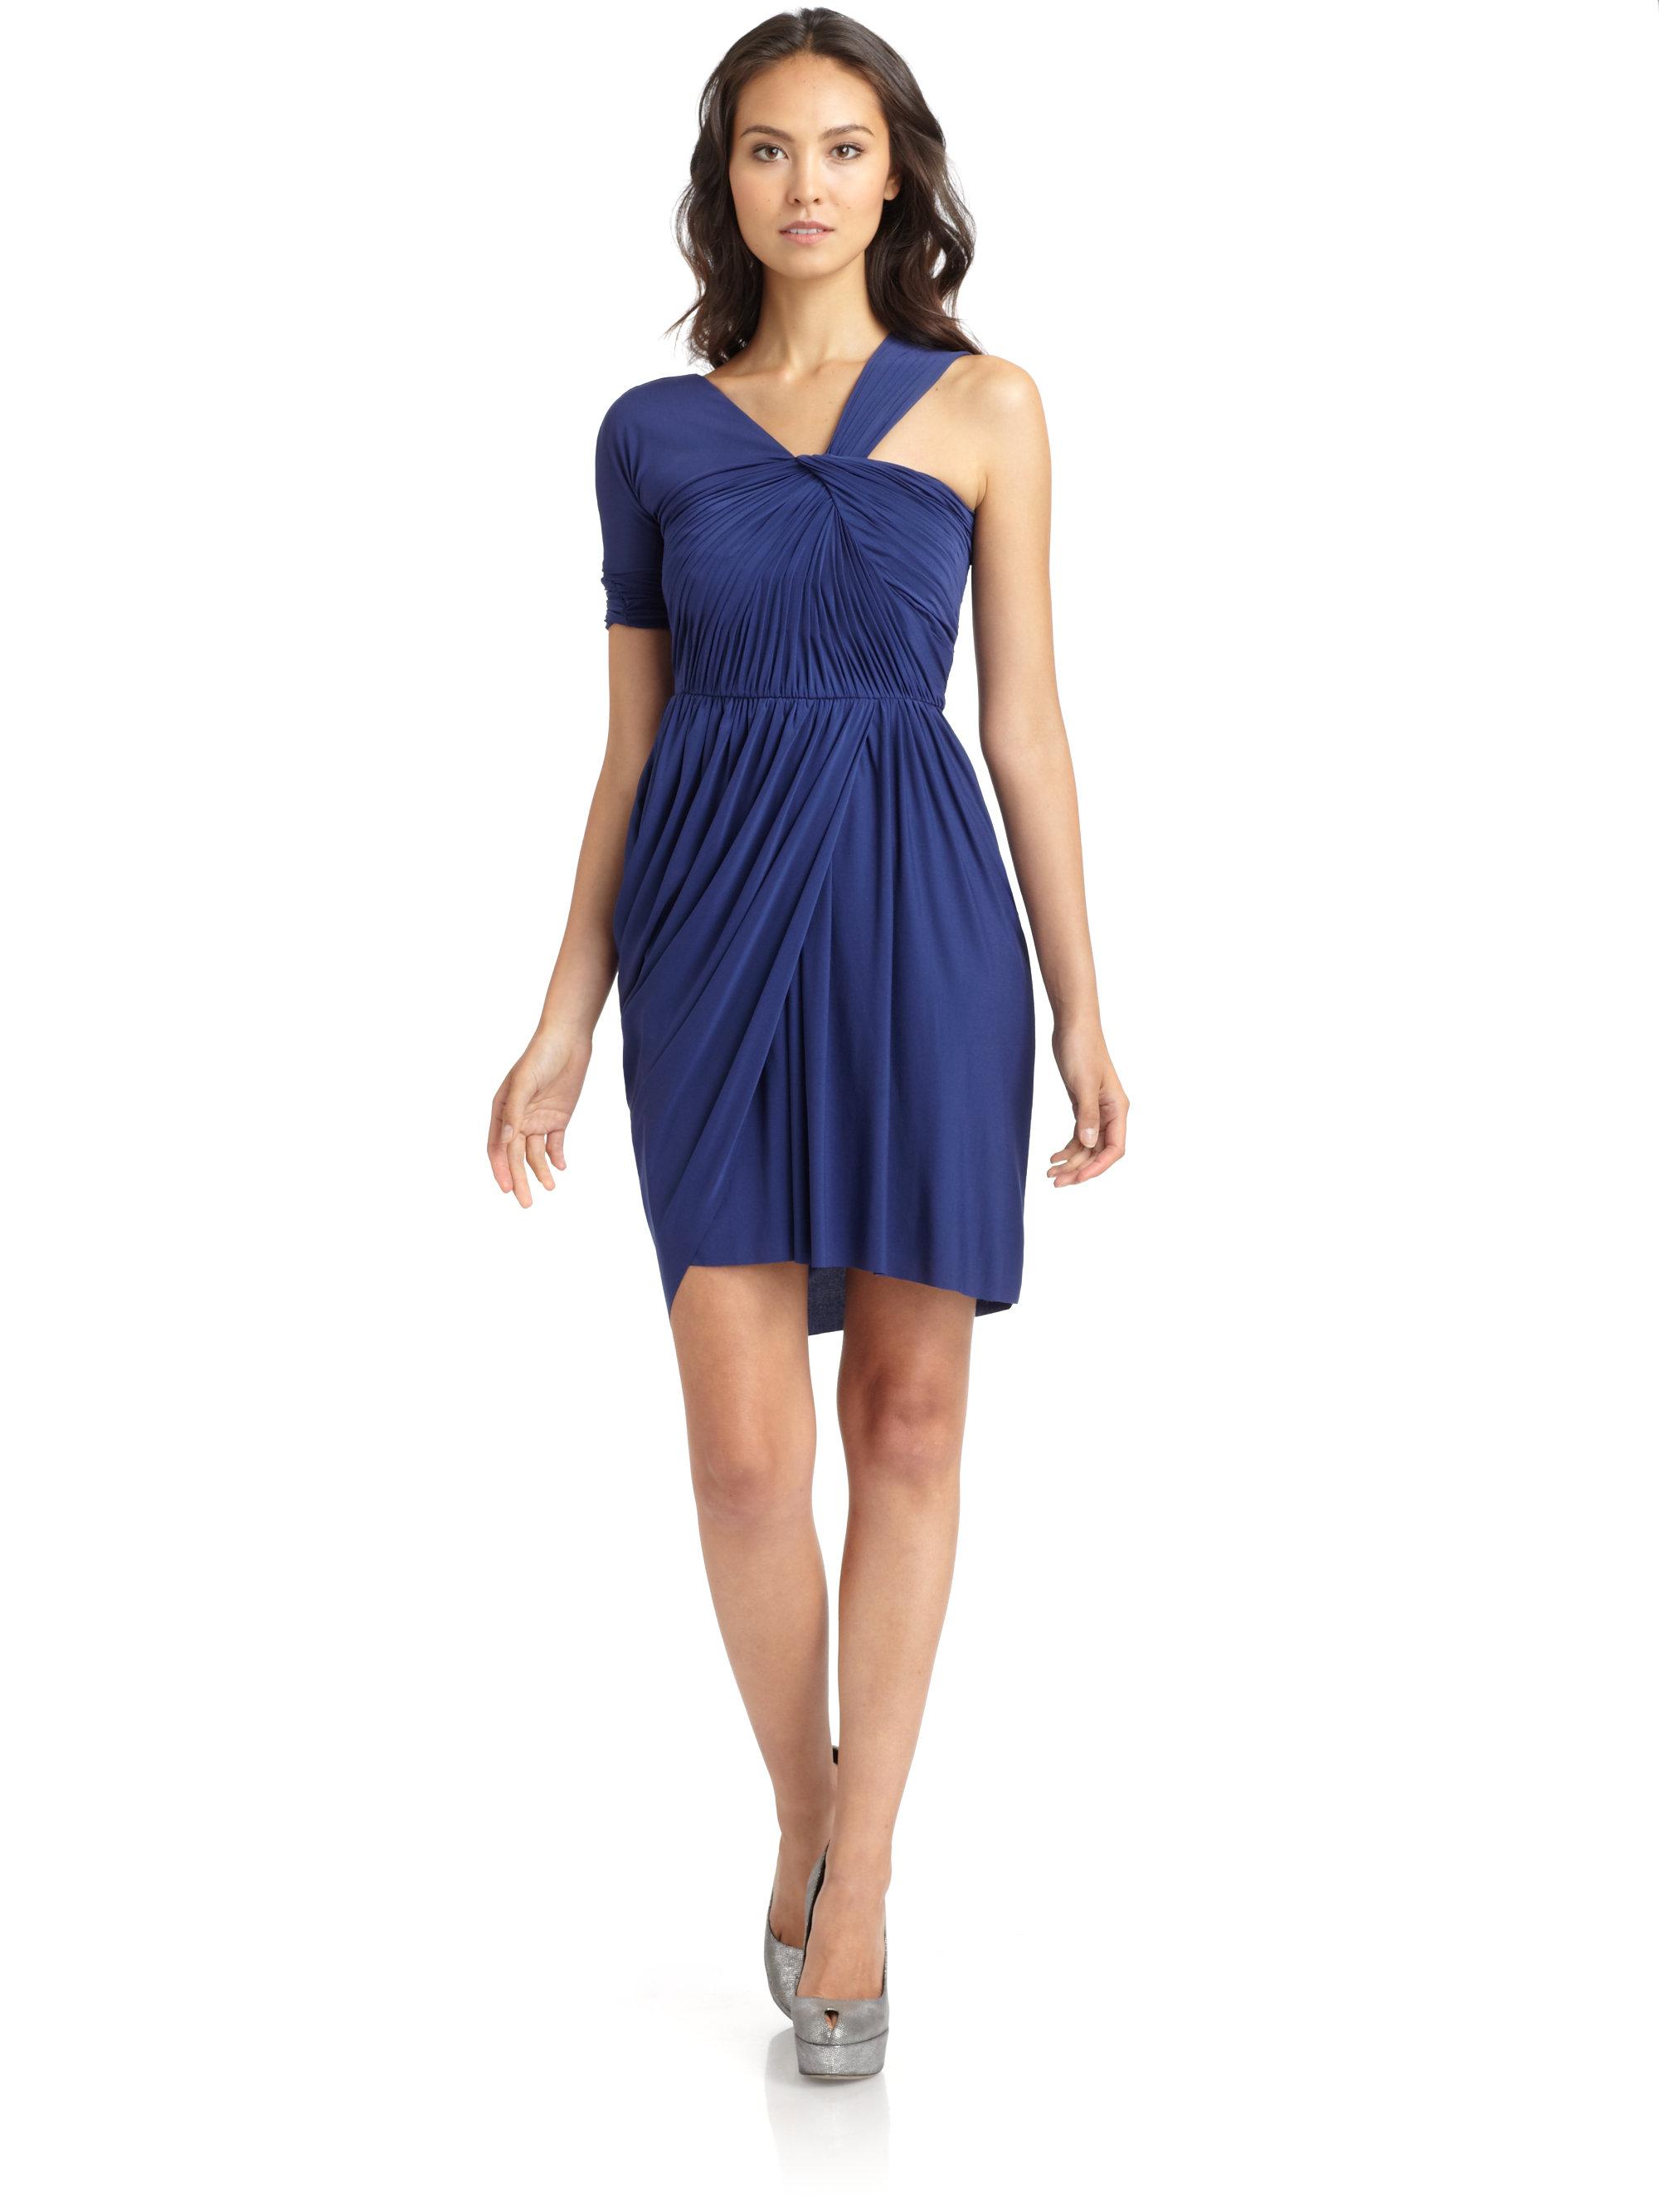 1bc8aa9686 Lyst - BCBGMAXAZRIA Christina Ruched Asymmetric Cocktail Dress in Blue